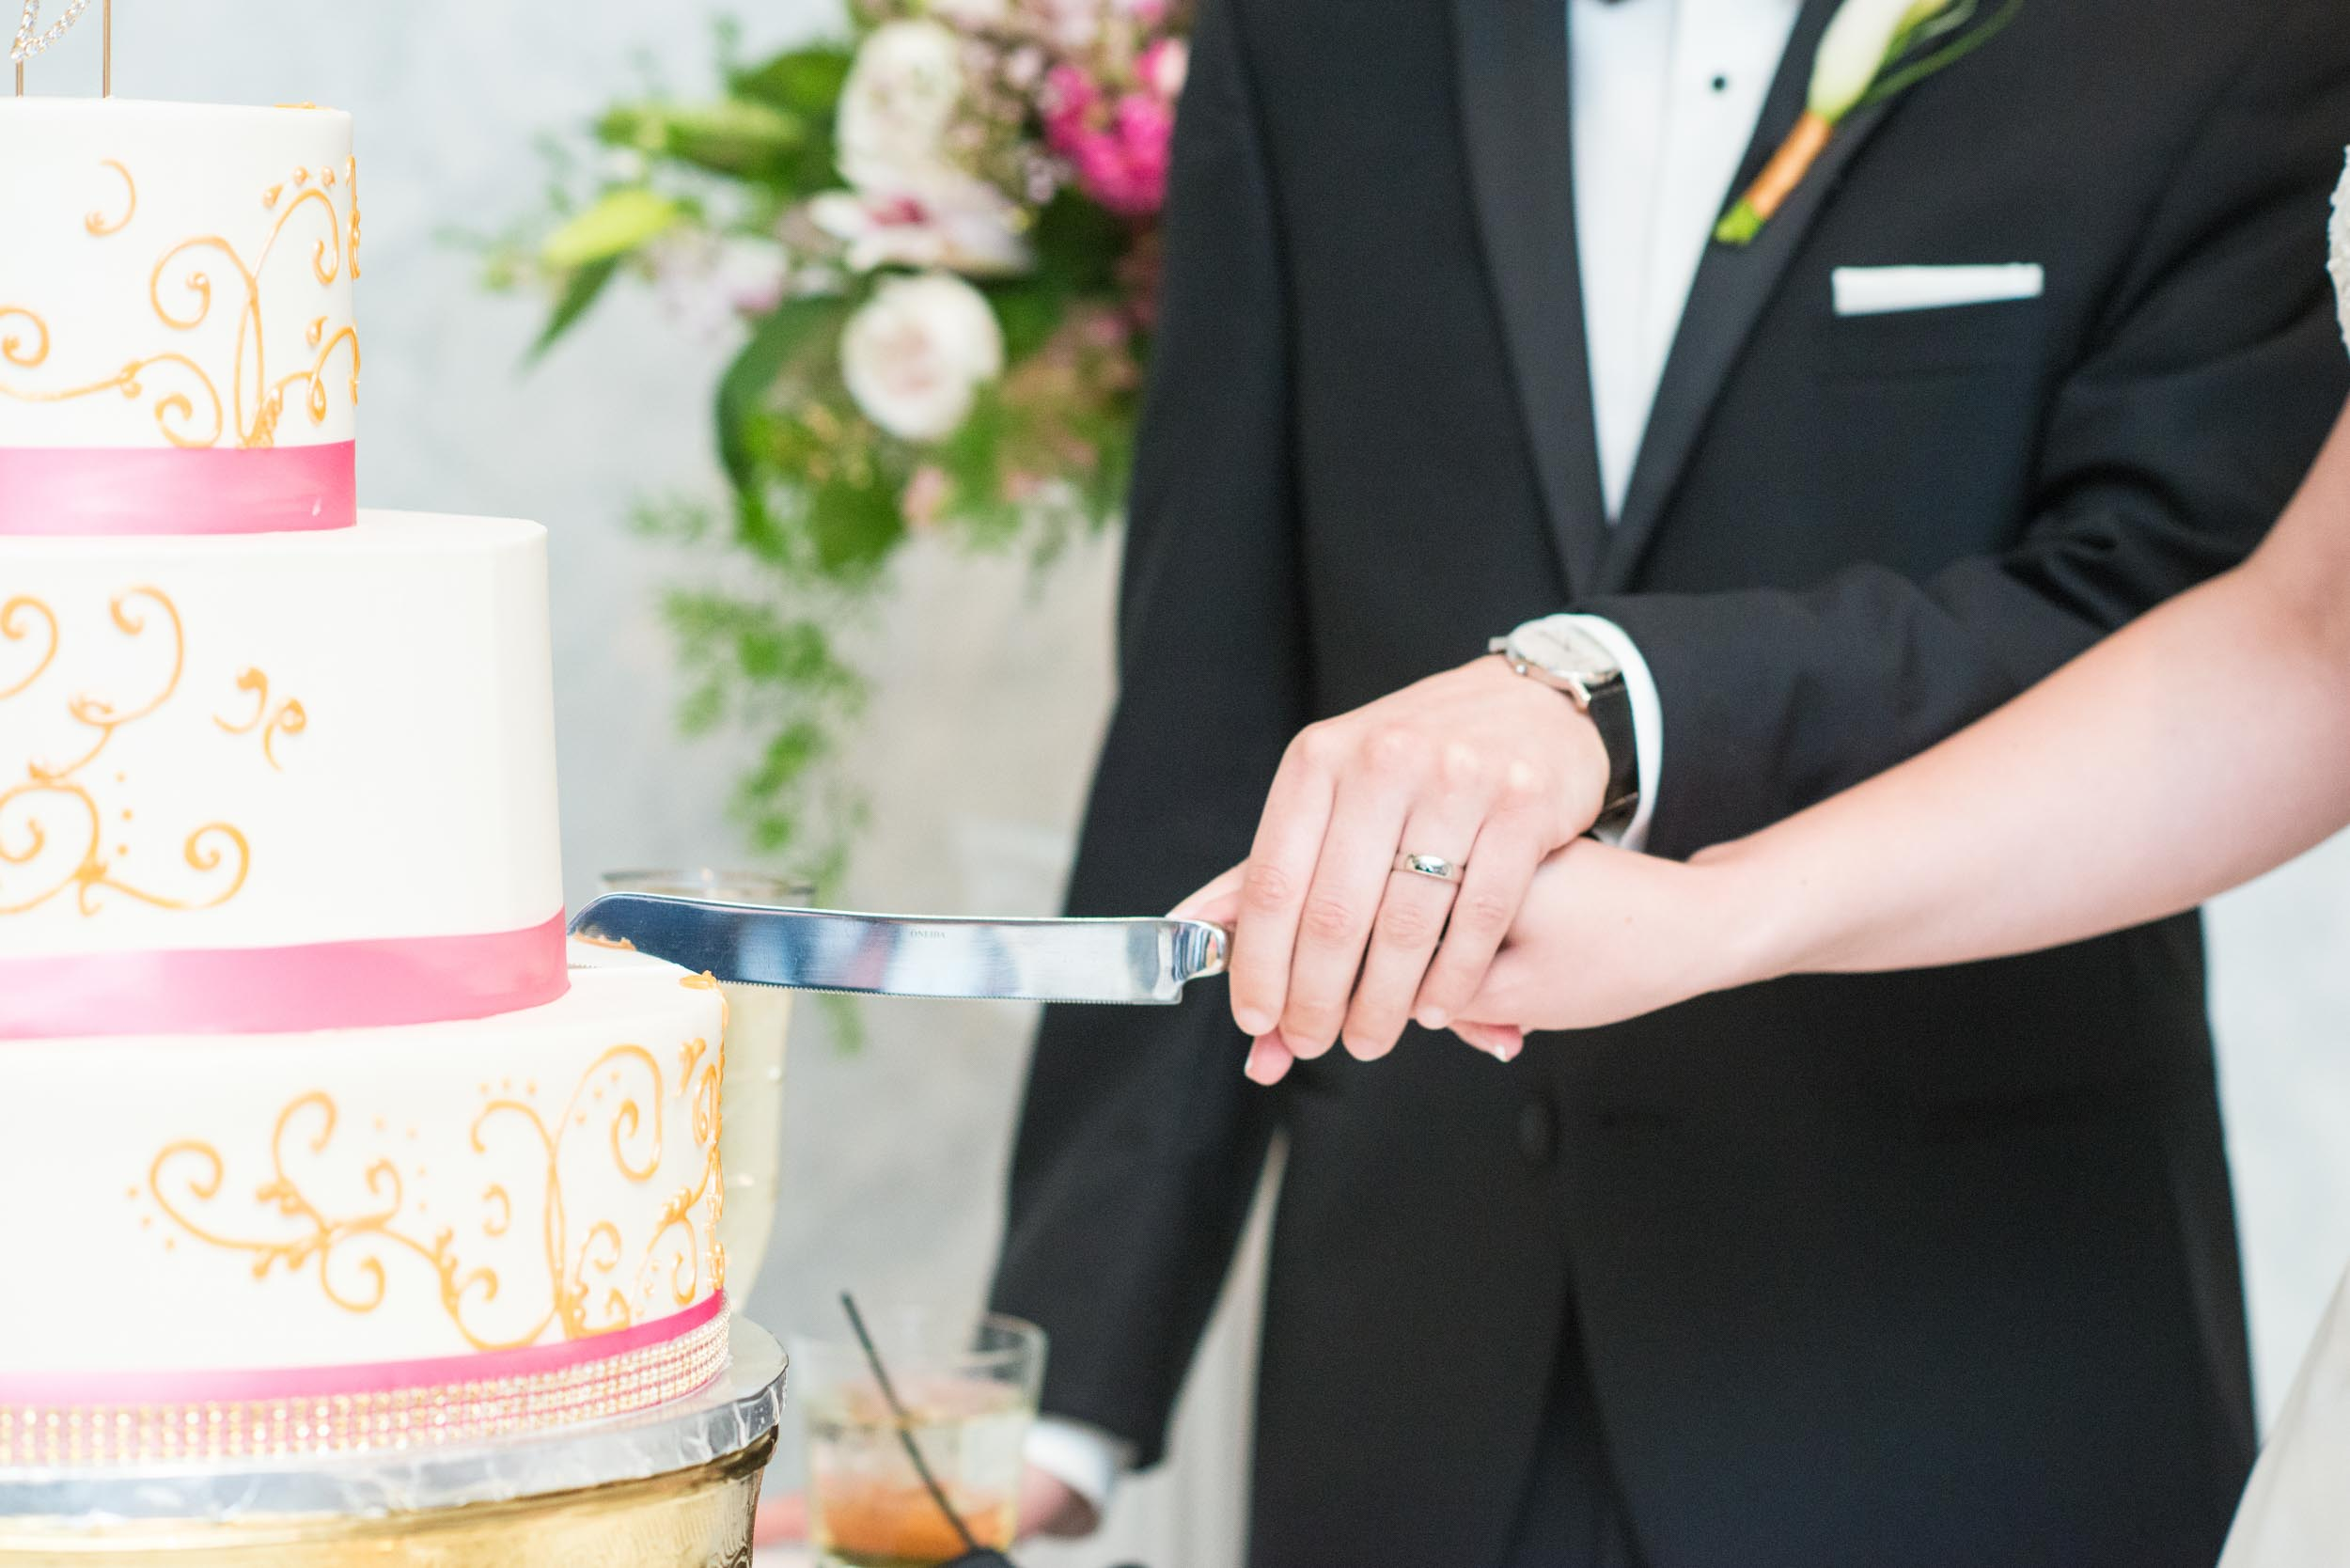 dc+metro+wedding+photographer+vadym+guliuk+photography+wedding+cake-cutting-2021.jpg